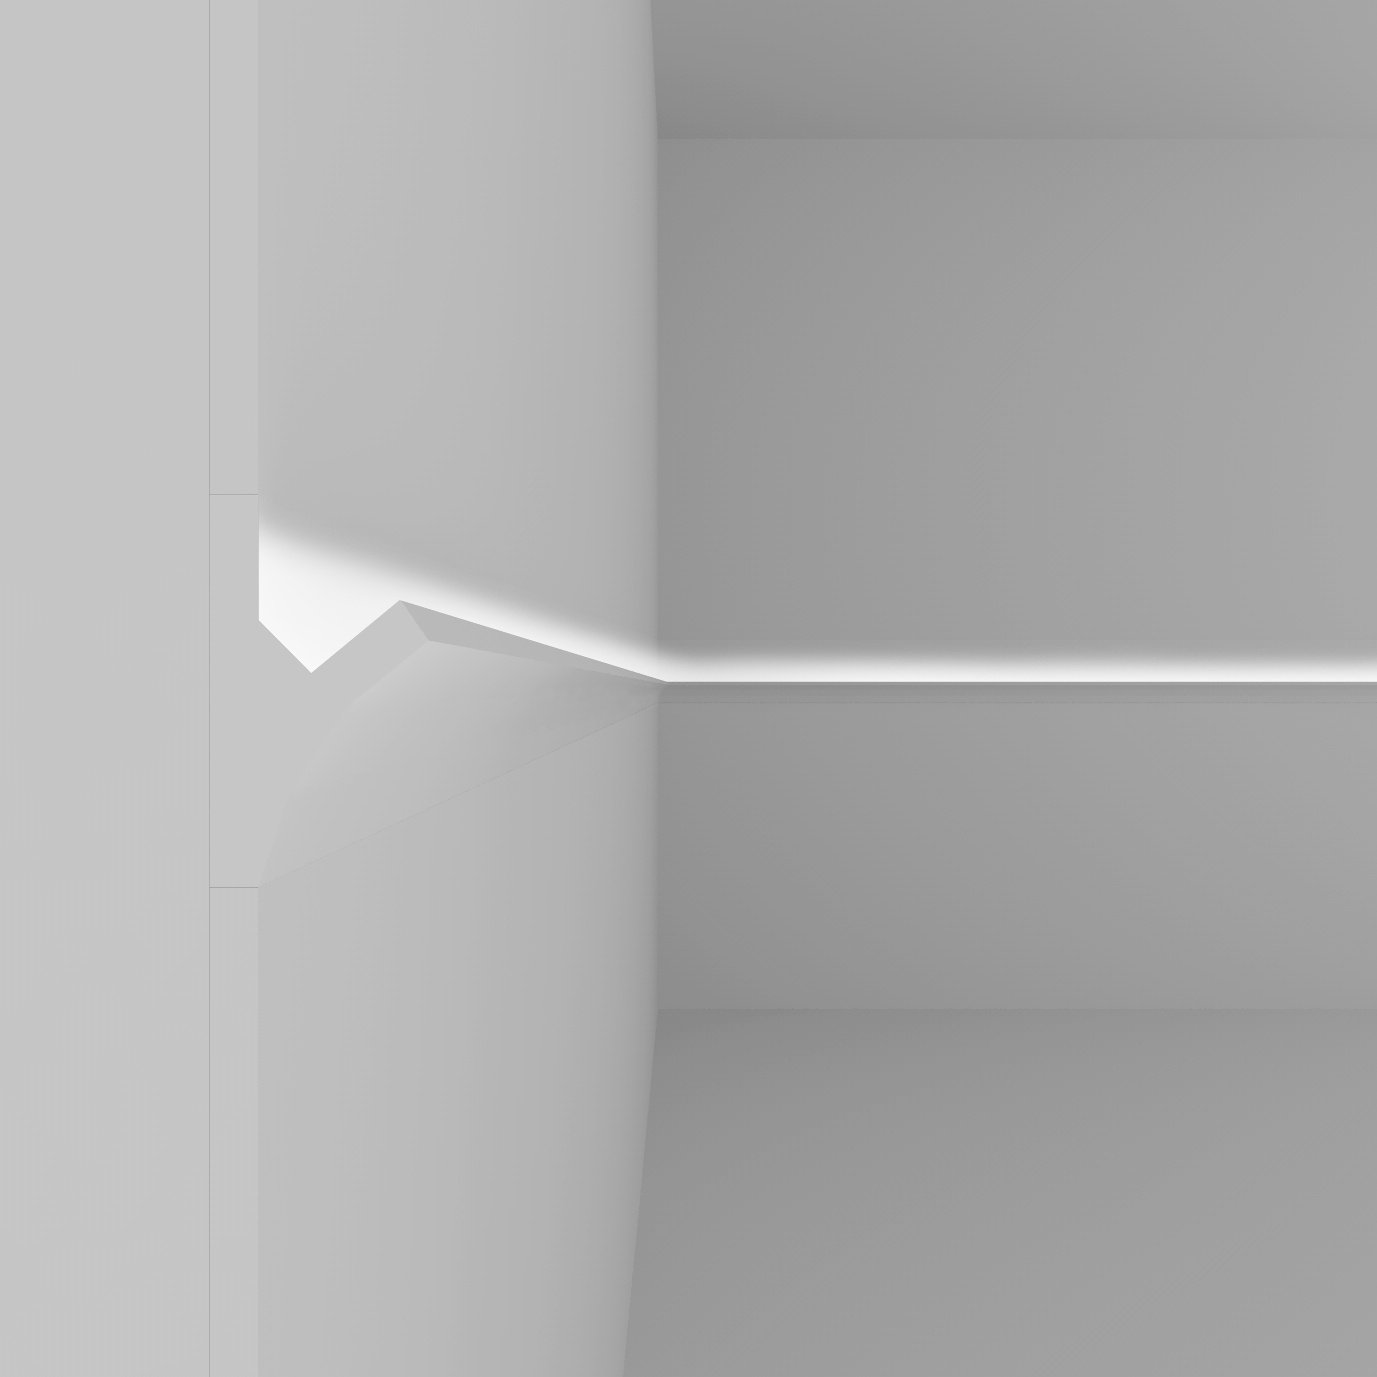 EL402-profili-illuminazione-indiretta-integrata-led